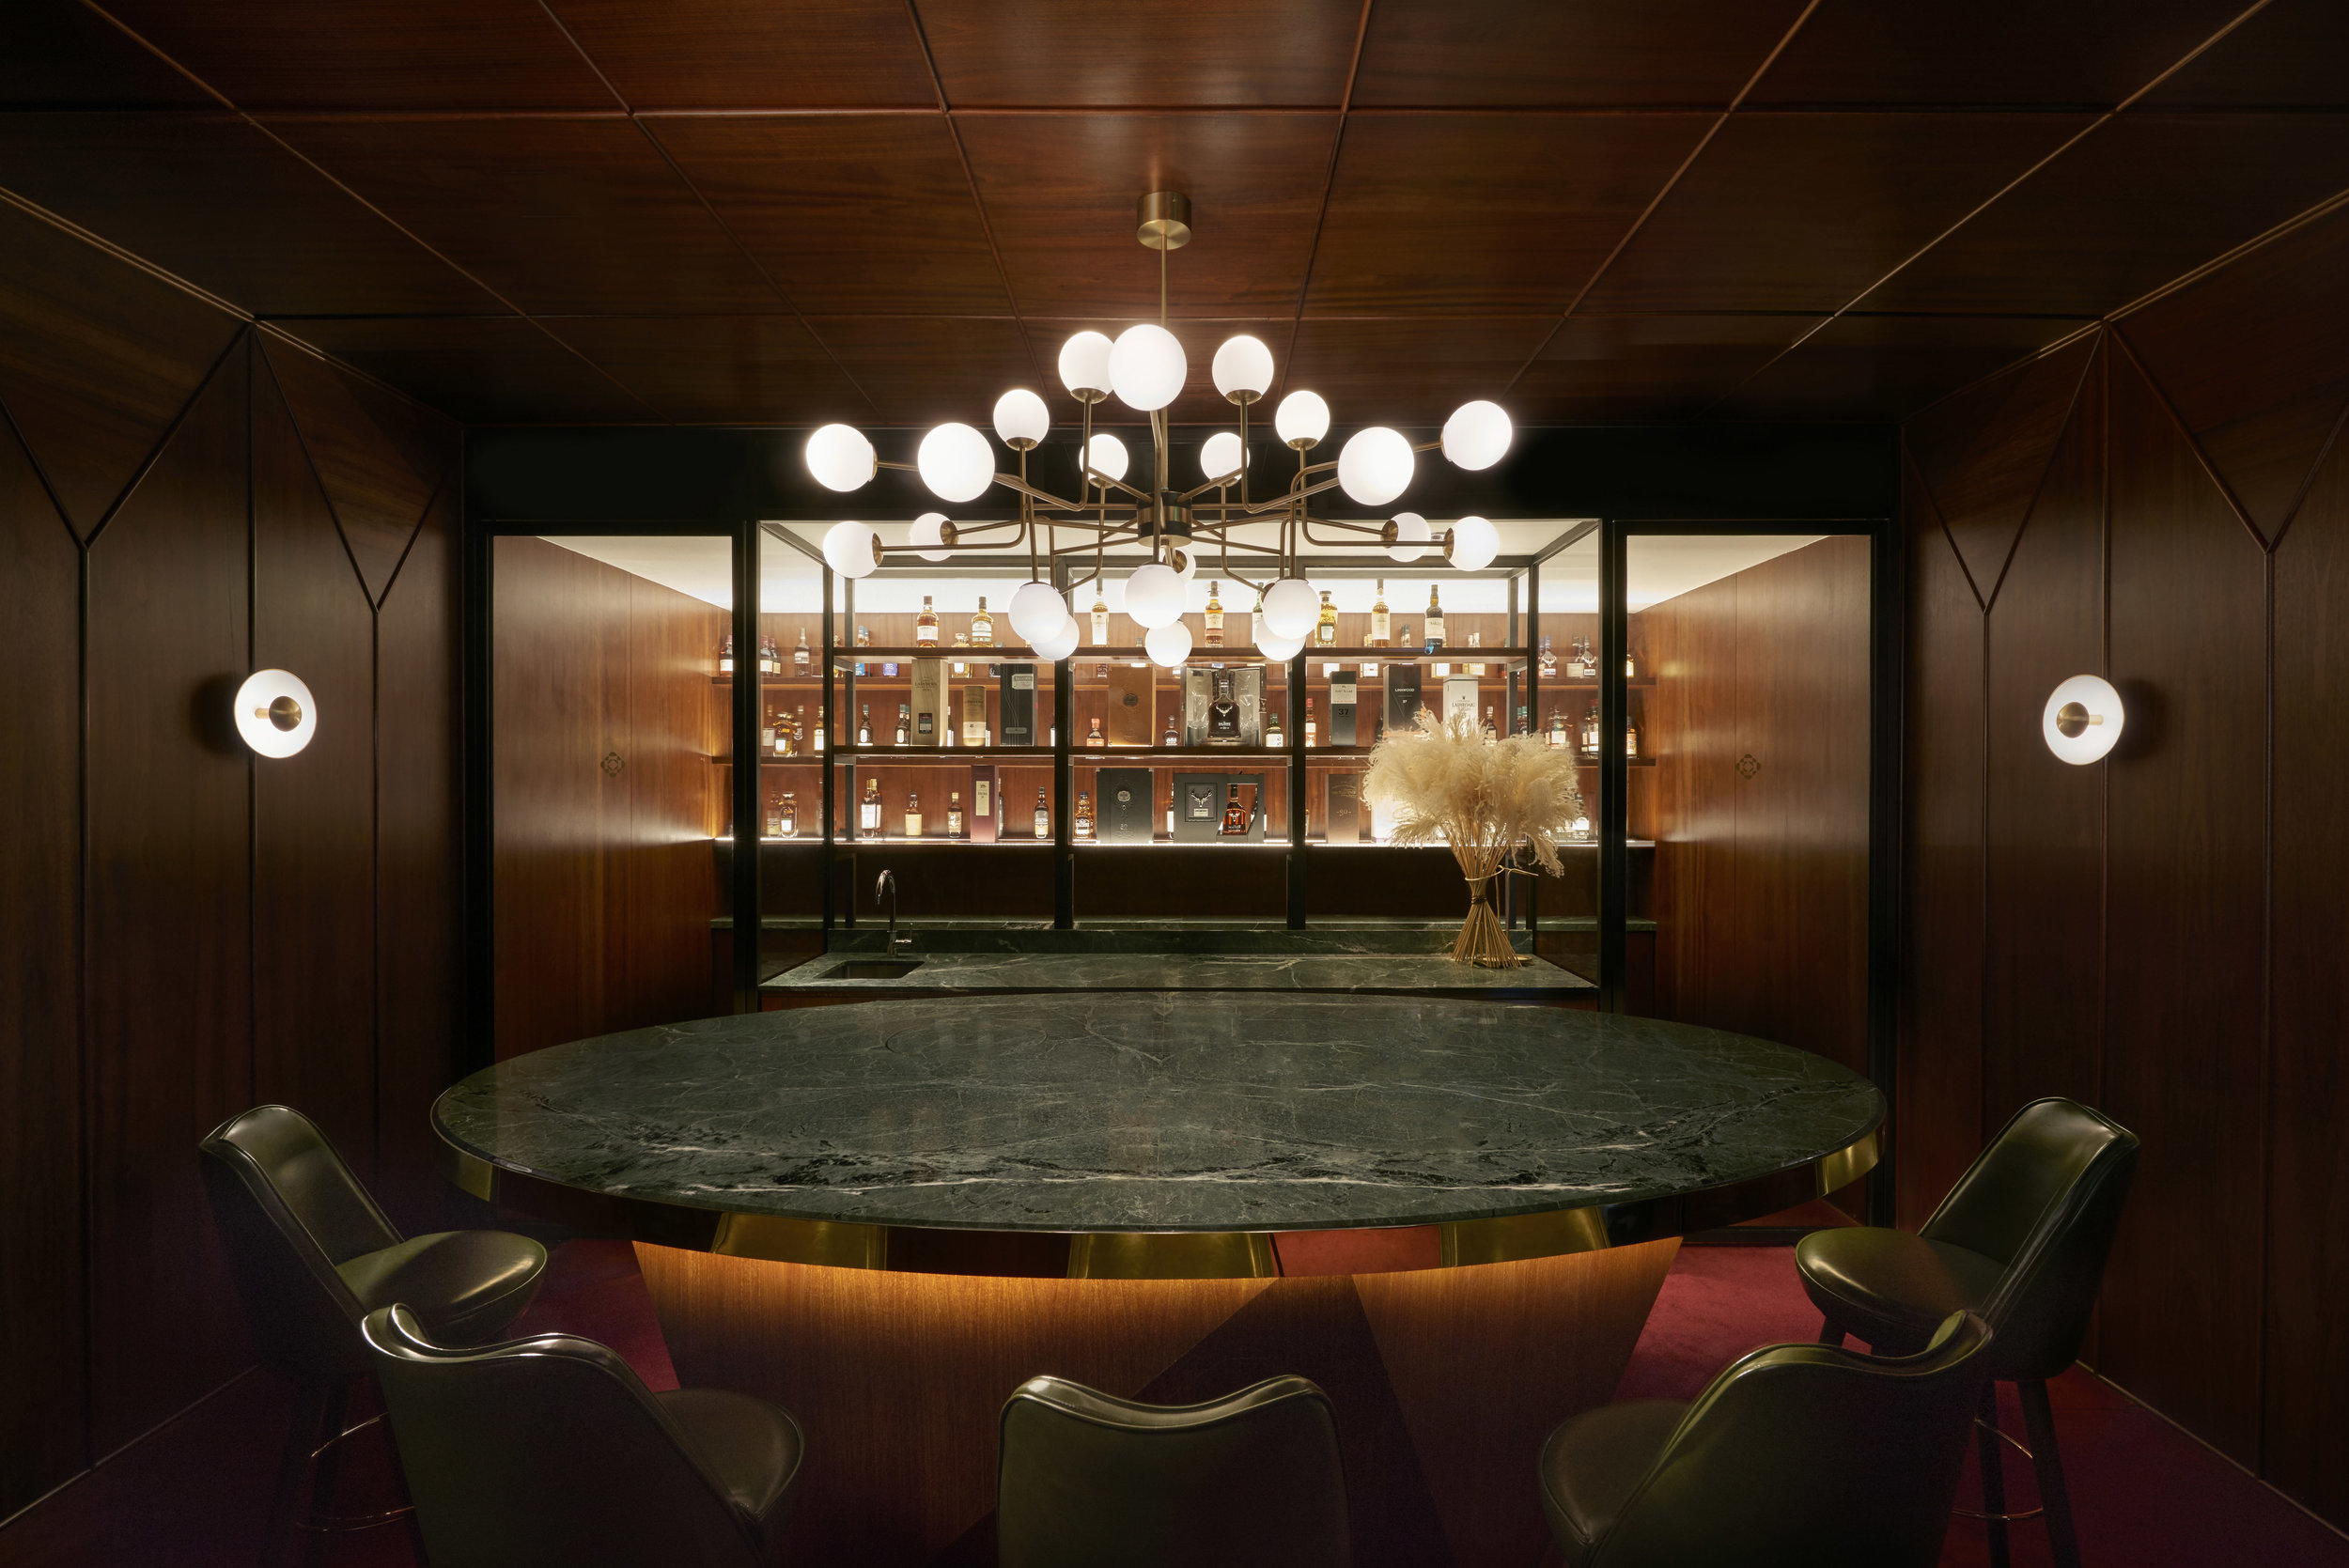 Whiskey Bar - Hires 6000px.jpg